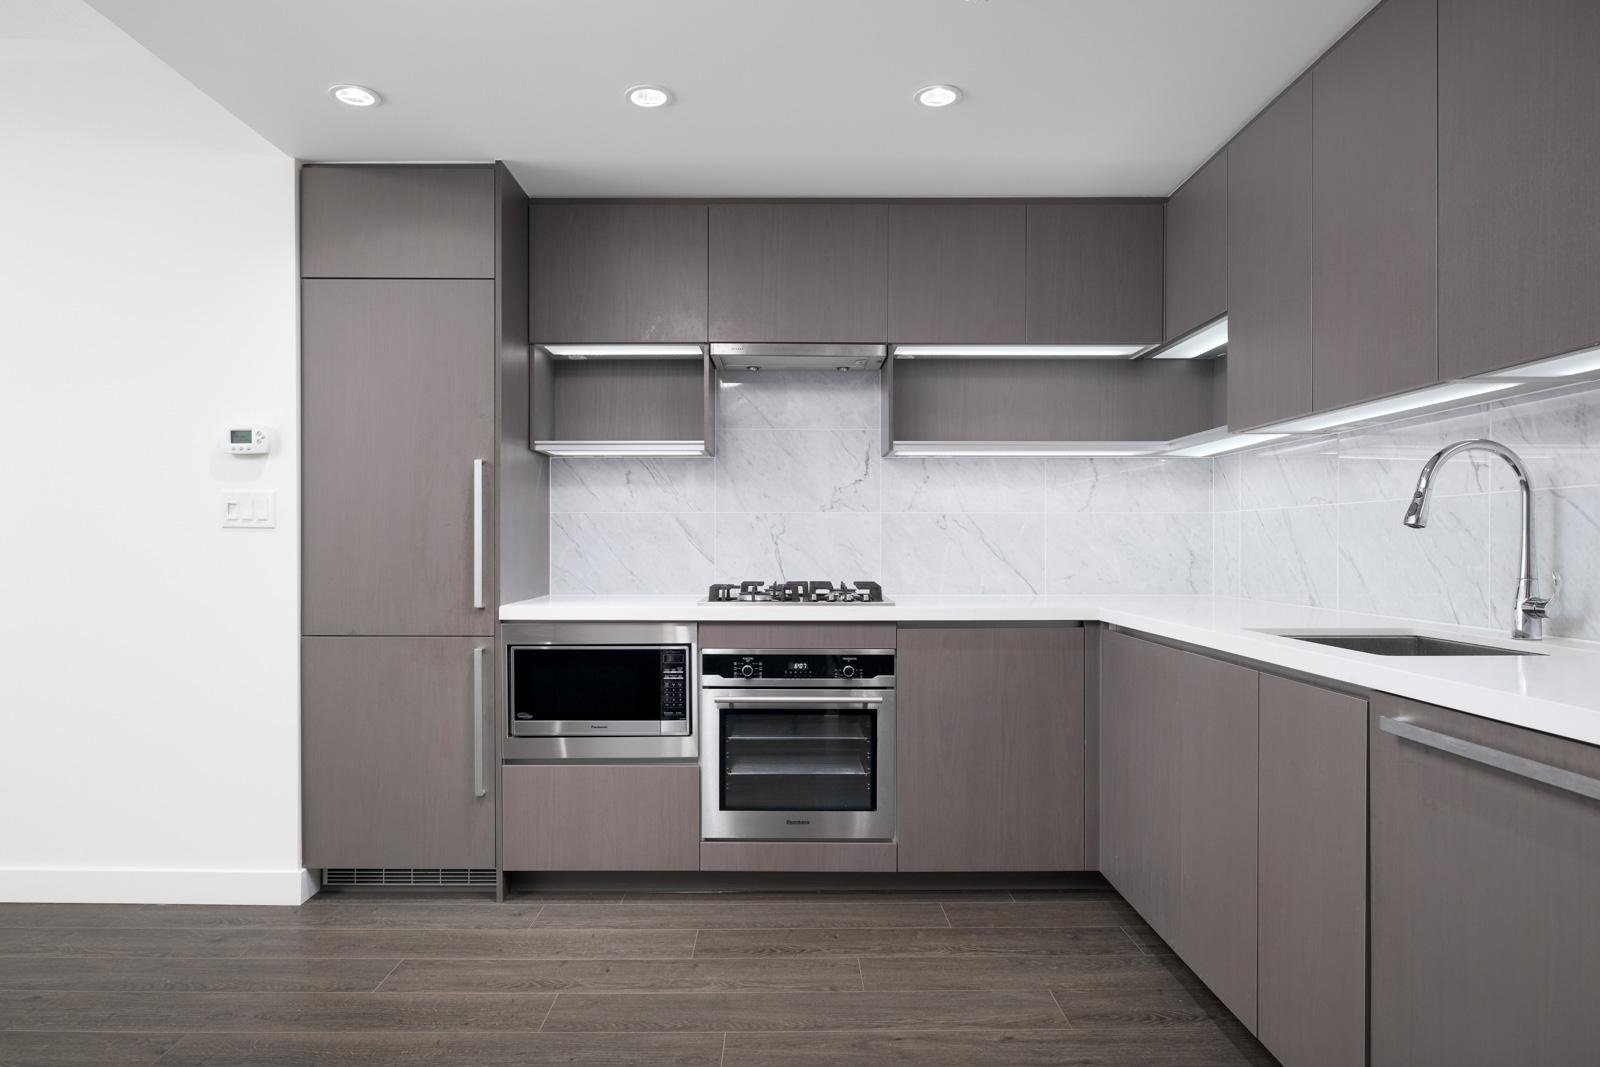 kitchen in rental condo with birds nest properties property management in burnaby